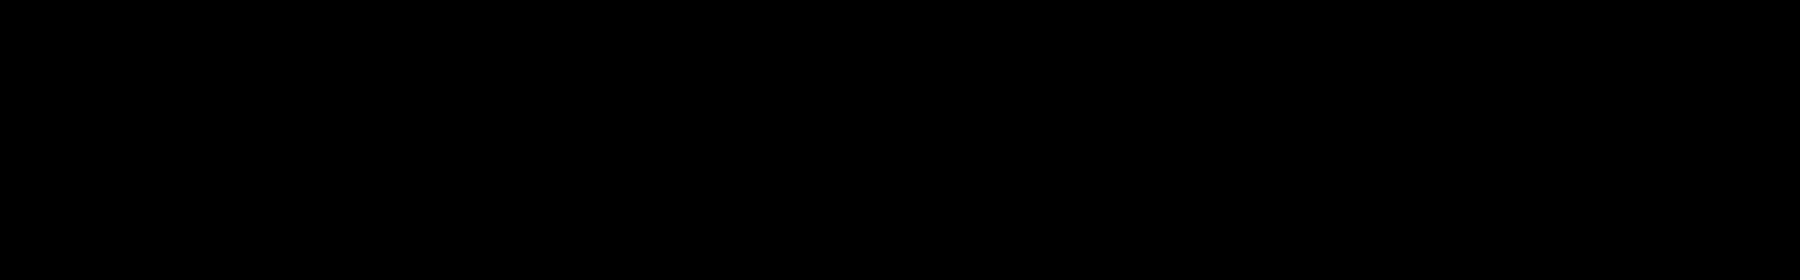 ProZone series ft GIGI BAROCCO – Massive Presets audio waveform